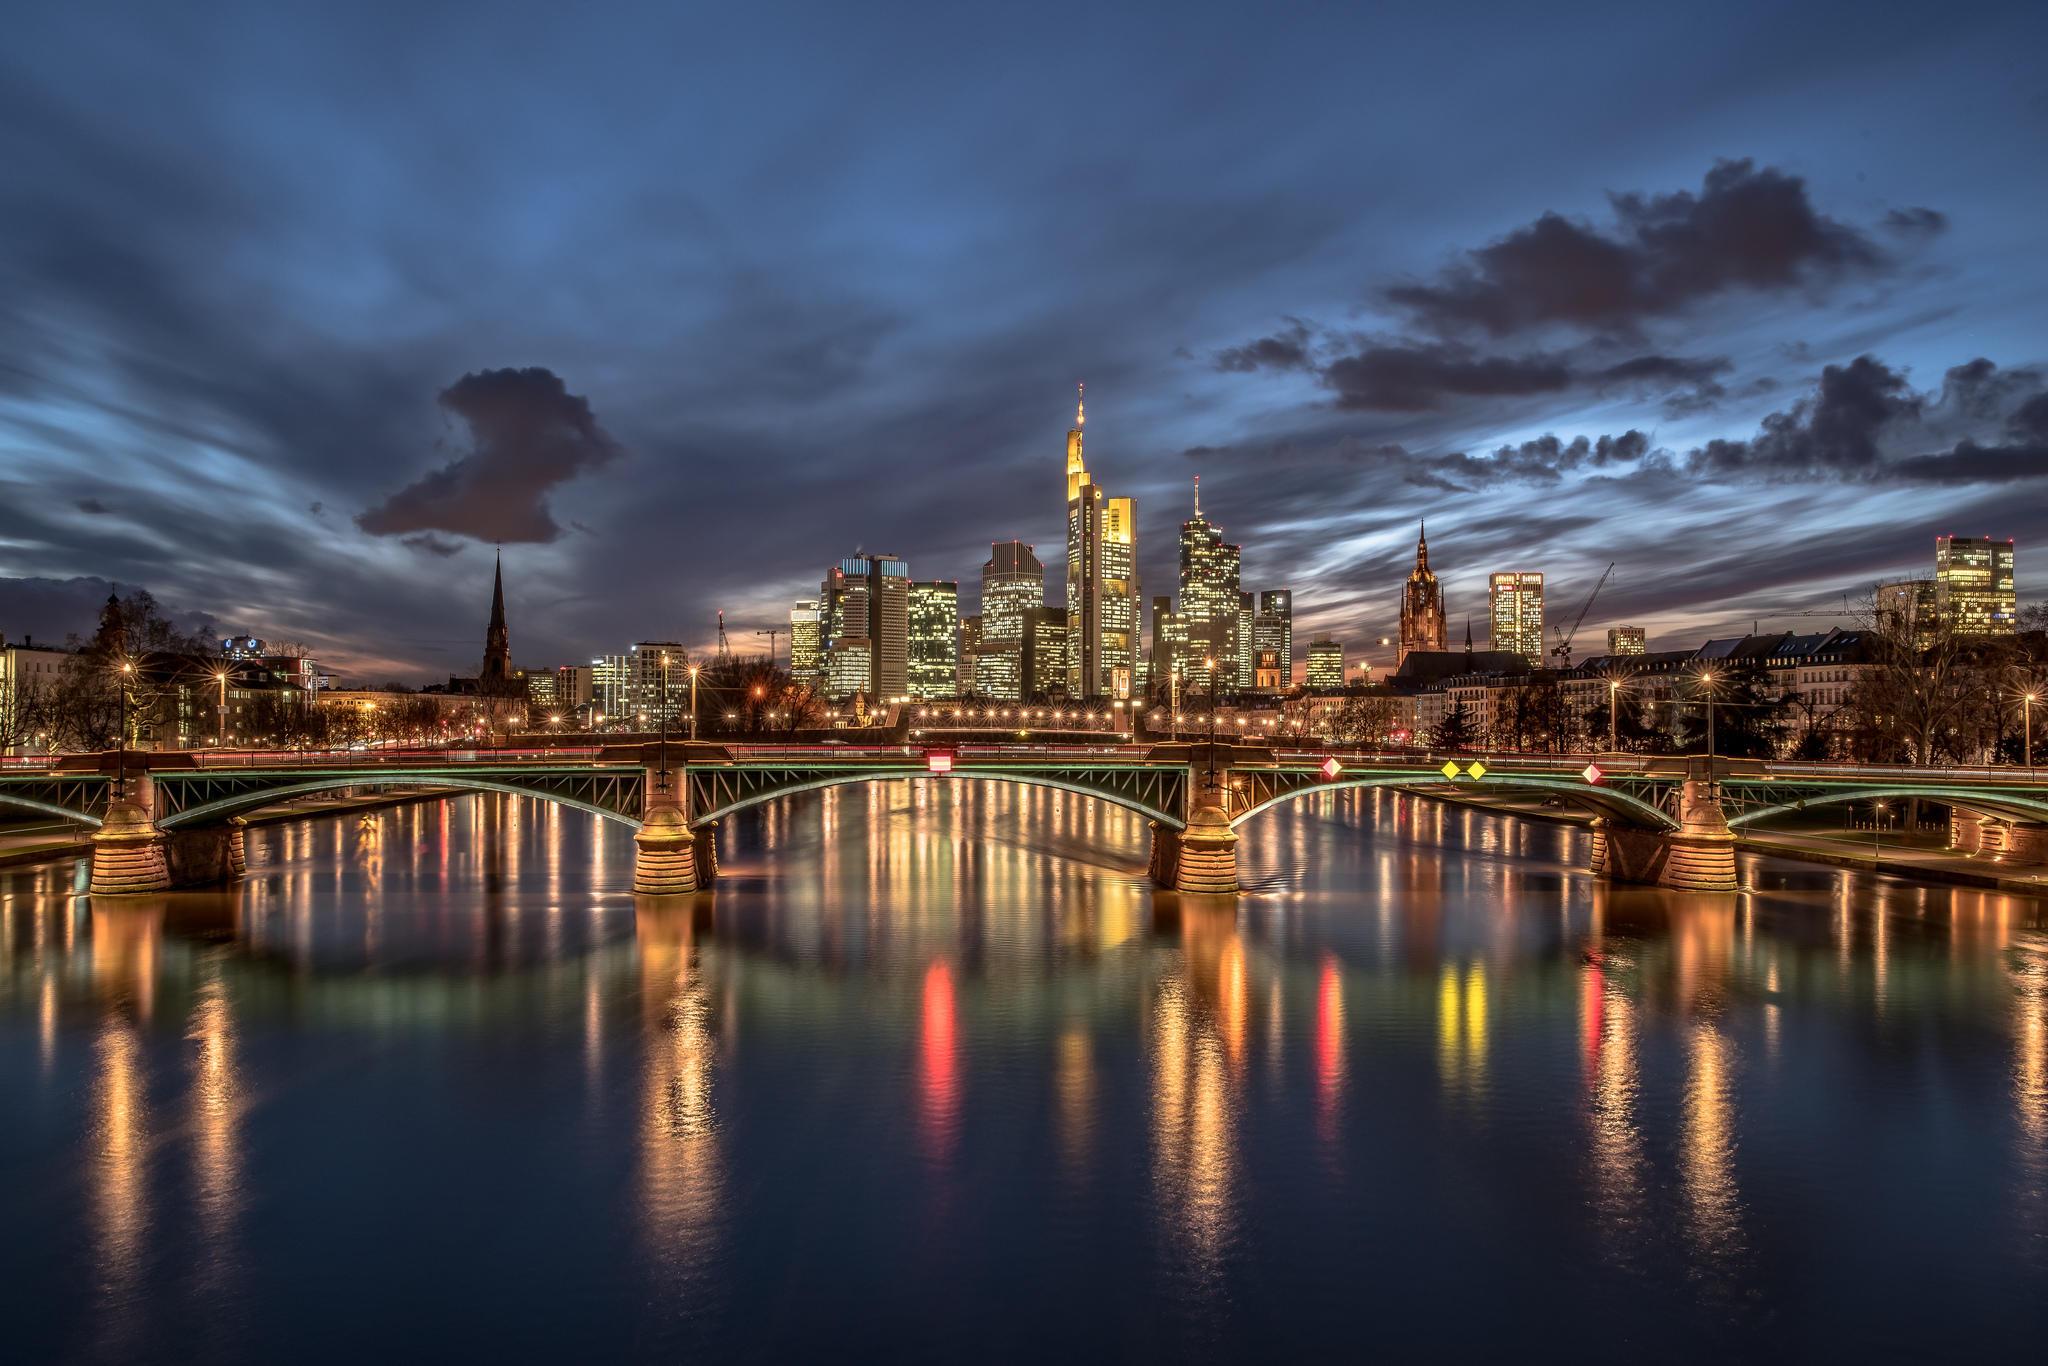 страны архитектура вечер город Франкфурт-на-Майне Германия  № 155585 без смс